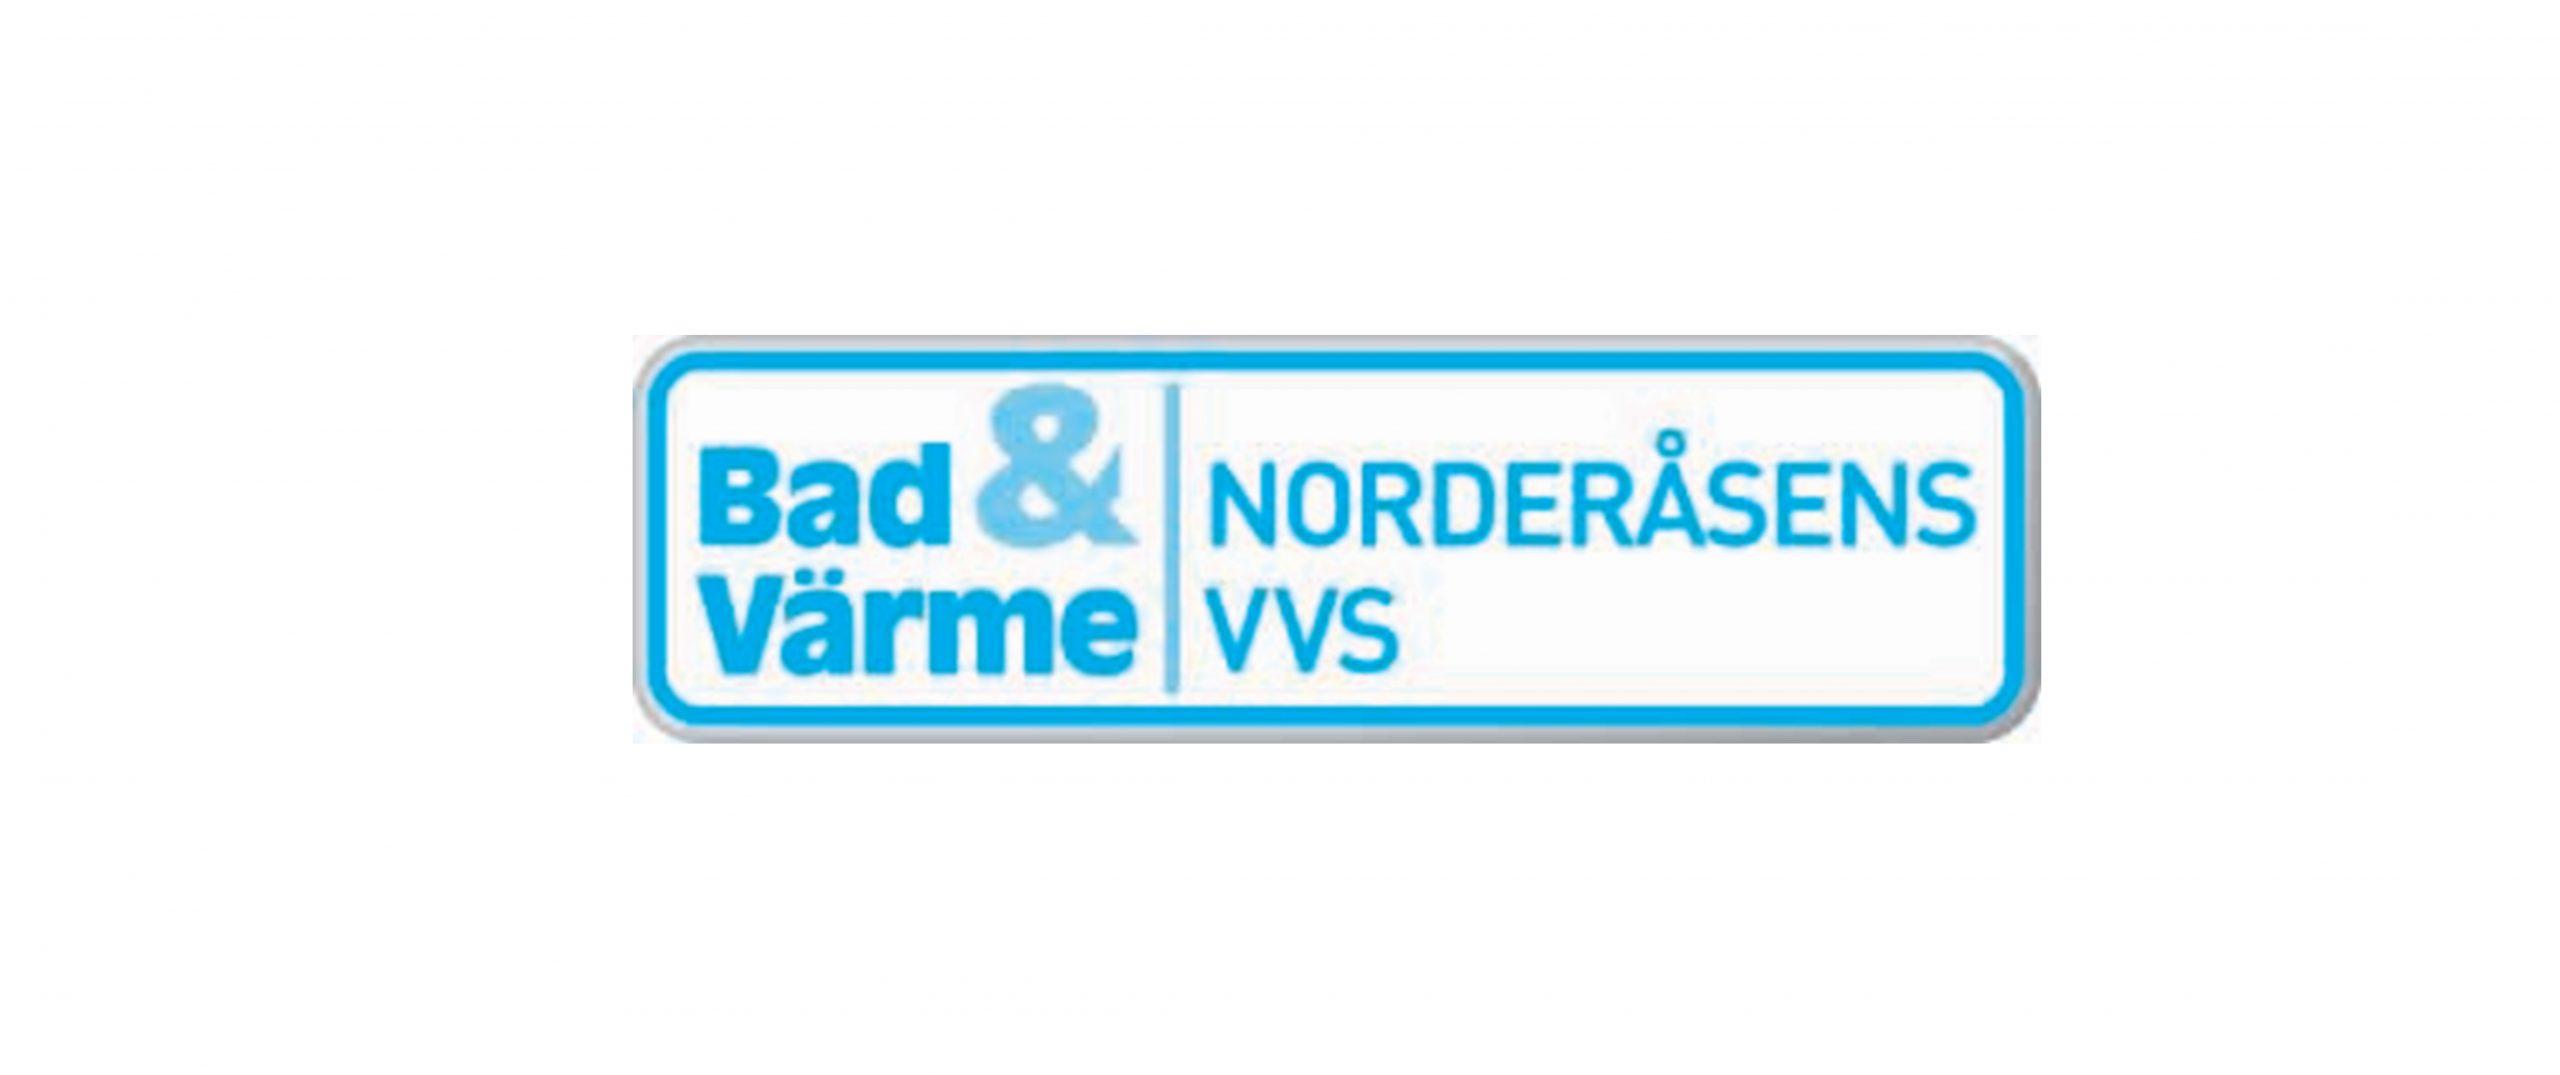 Norderåsens VVS